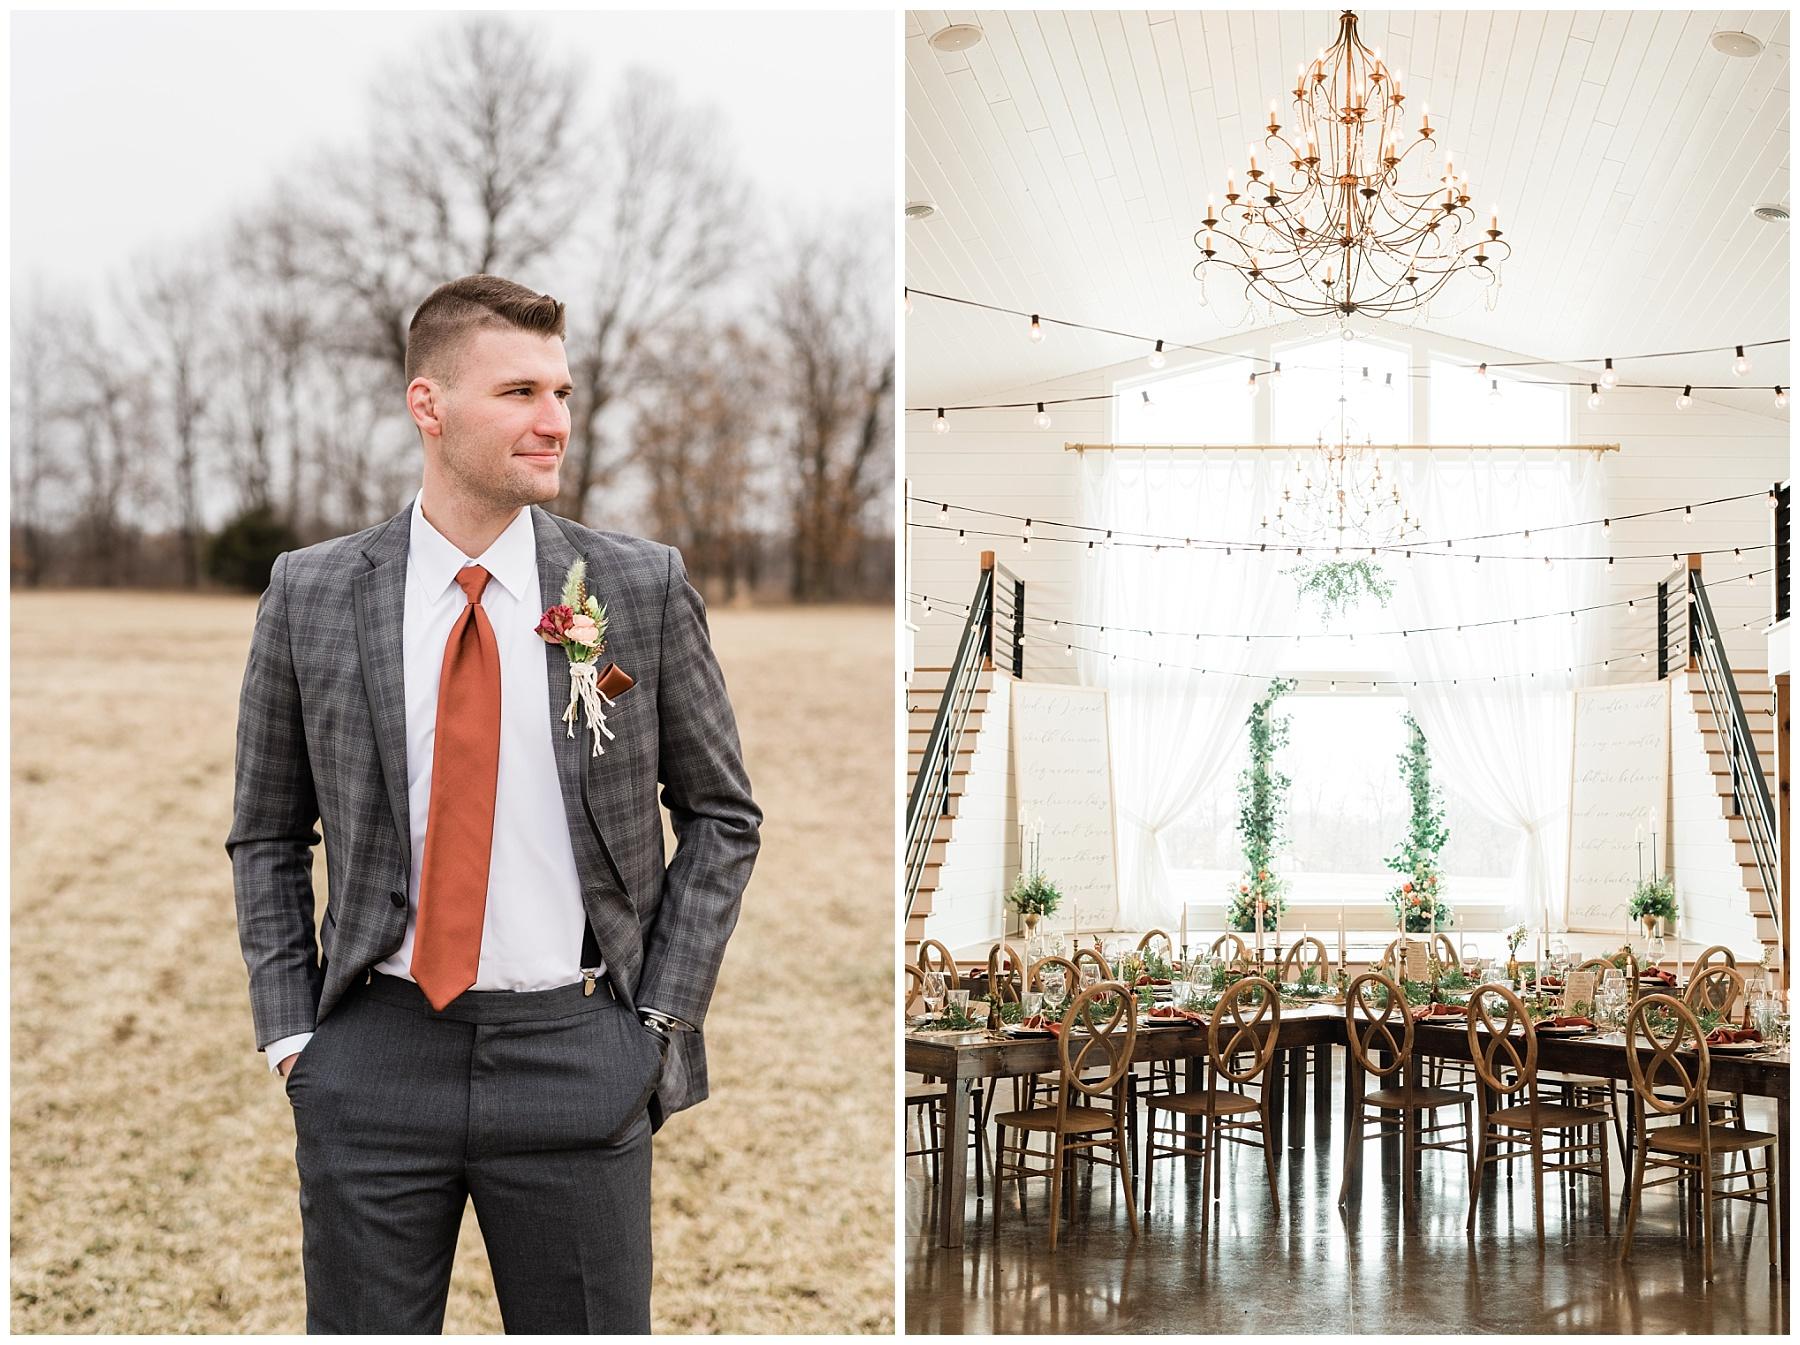 Eclectic Scandinavian Winter Wedding in All White Venue Emerson Fields by Kelsi Kliethermes Photography Best Missouri and Maui Wedding Photographer_0054.jpg